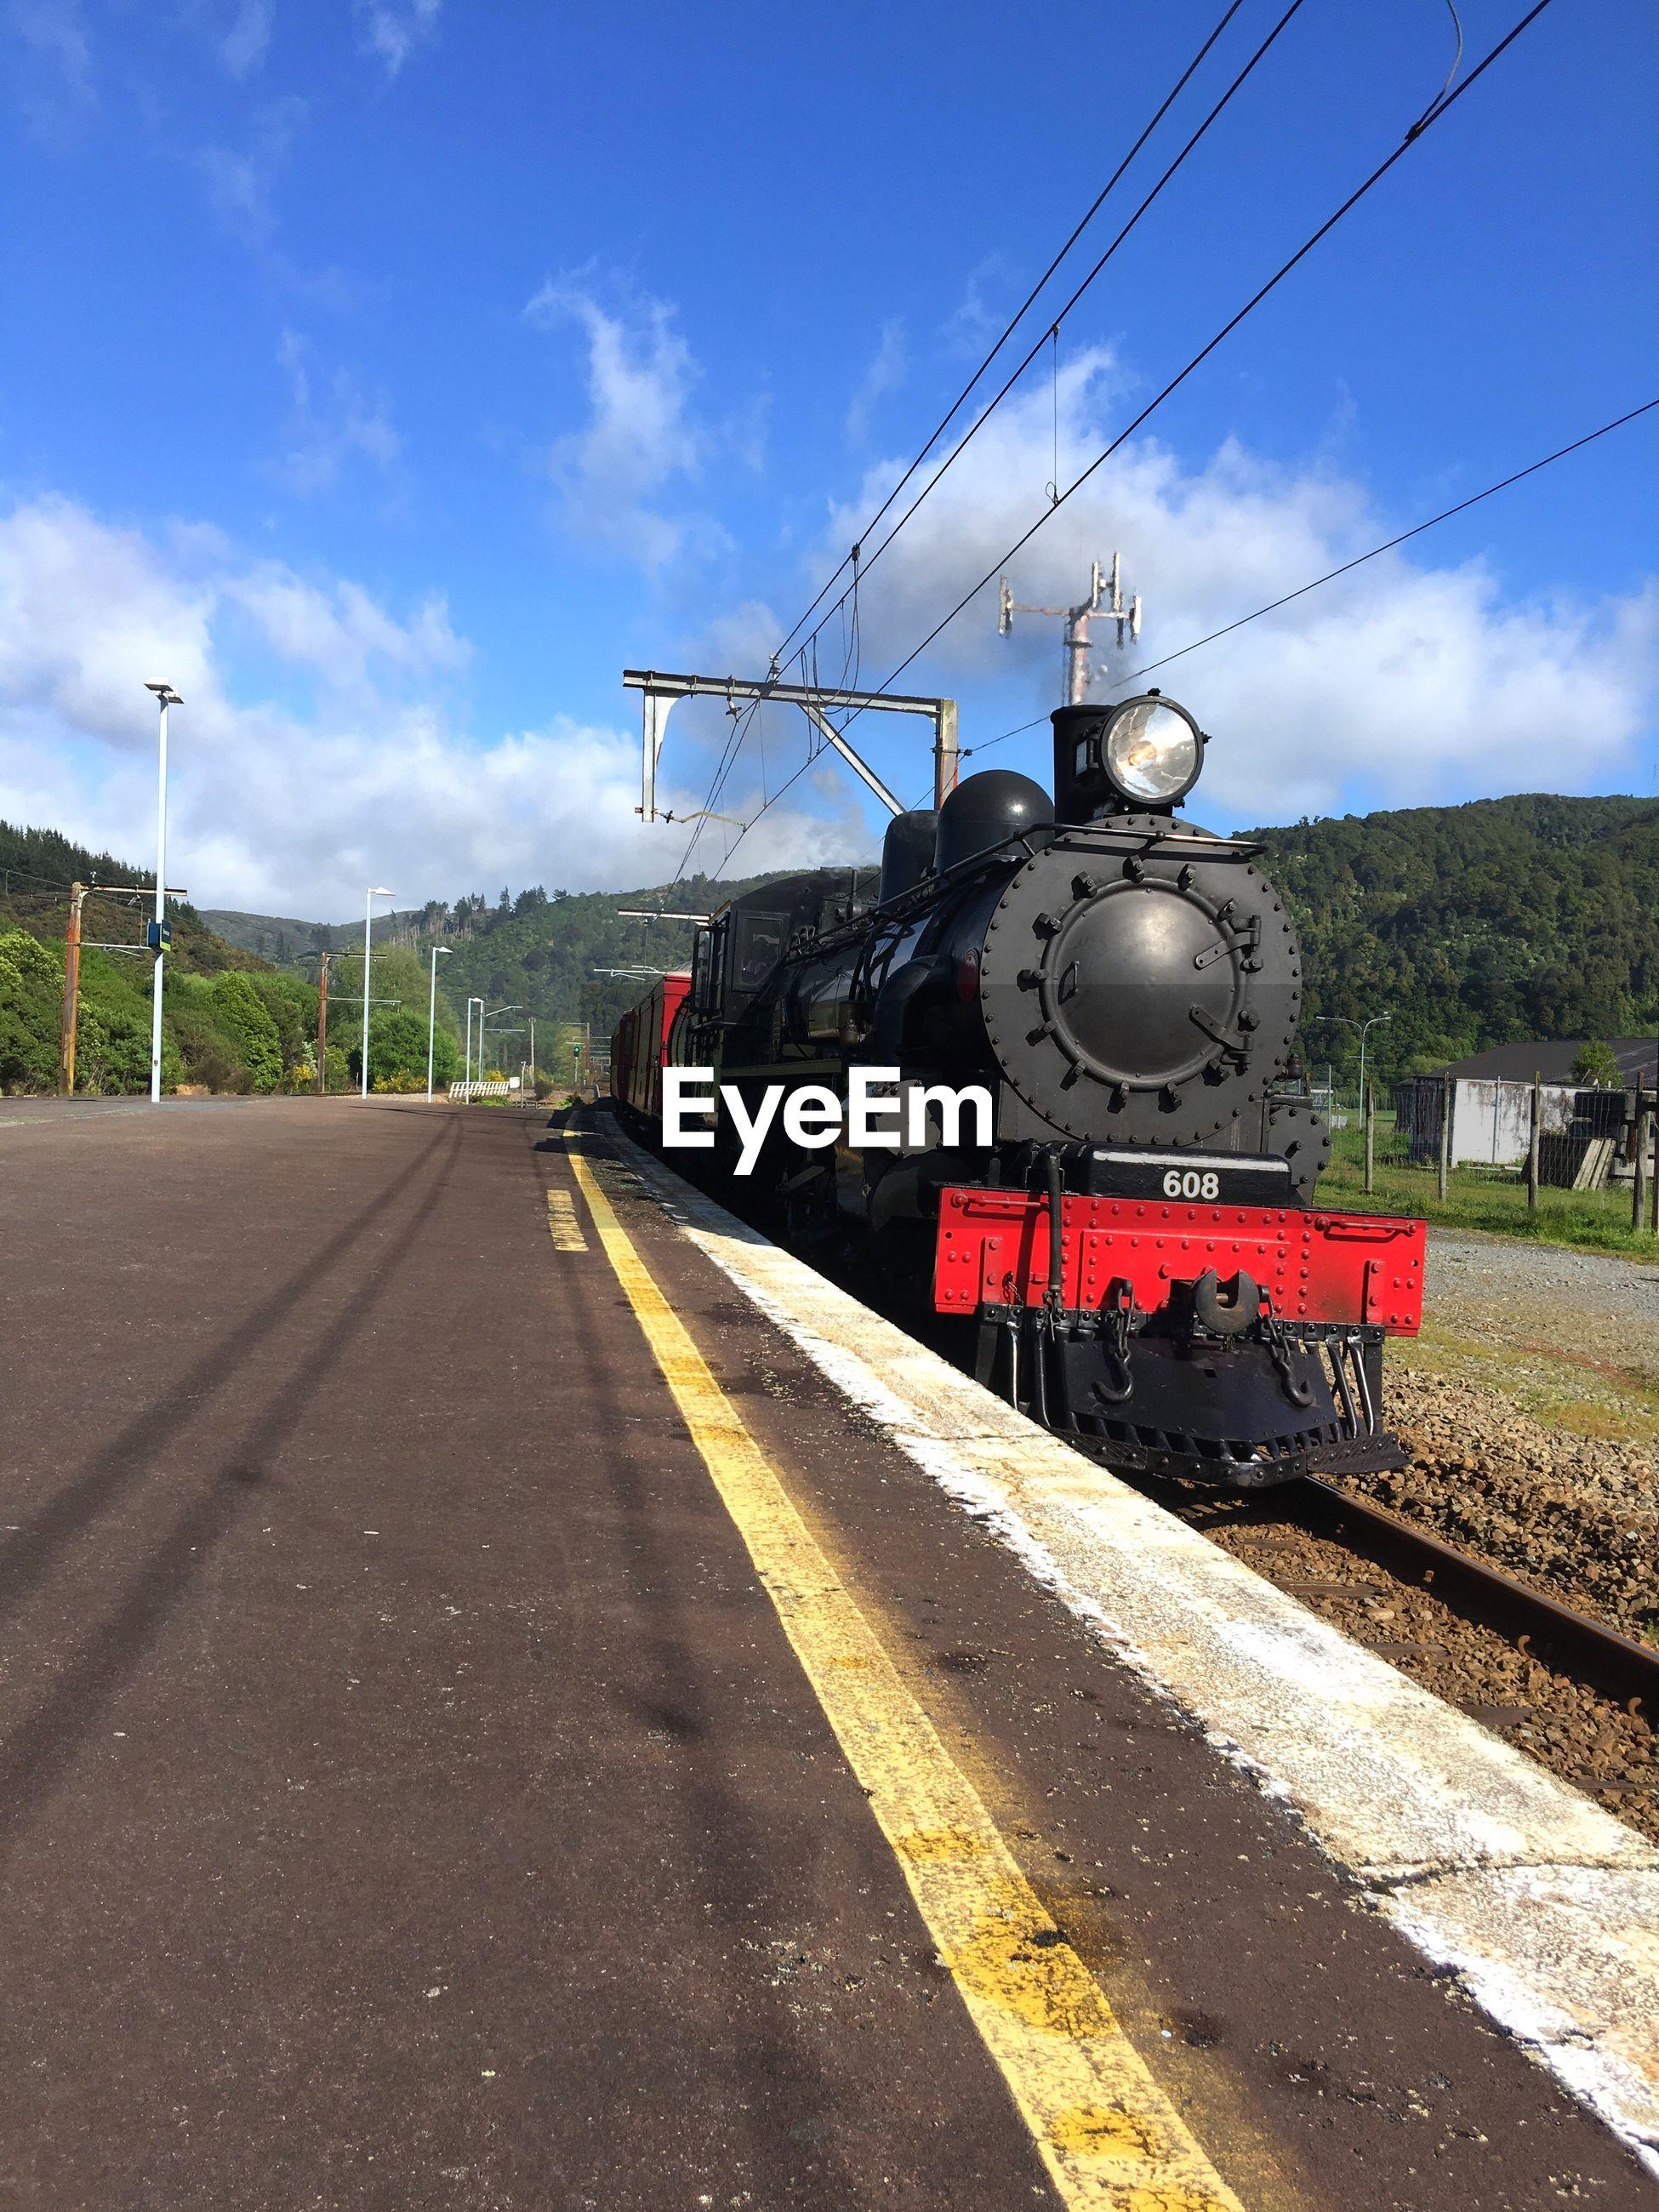 Steam train on railroad track against sky